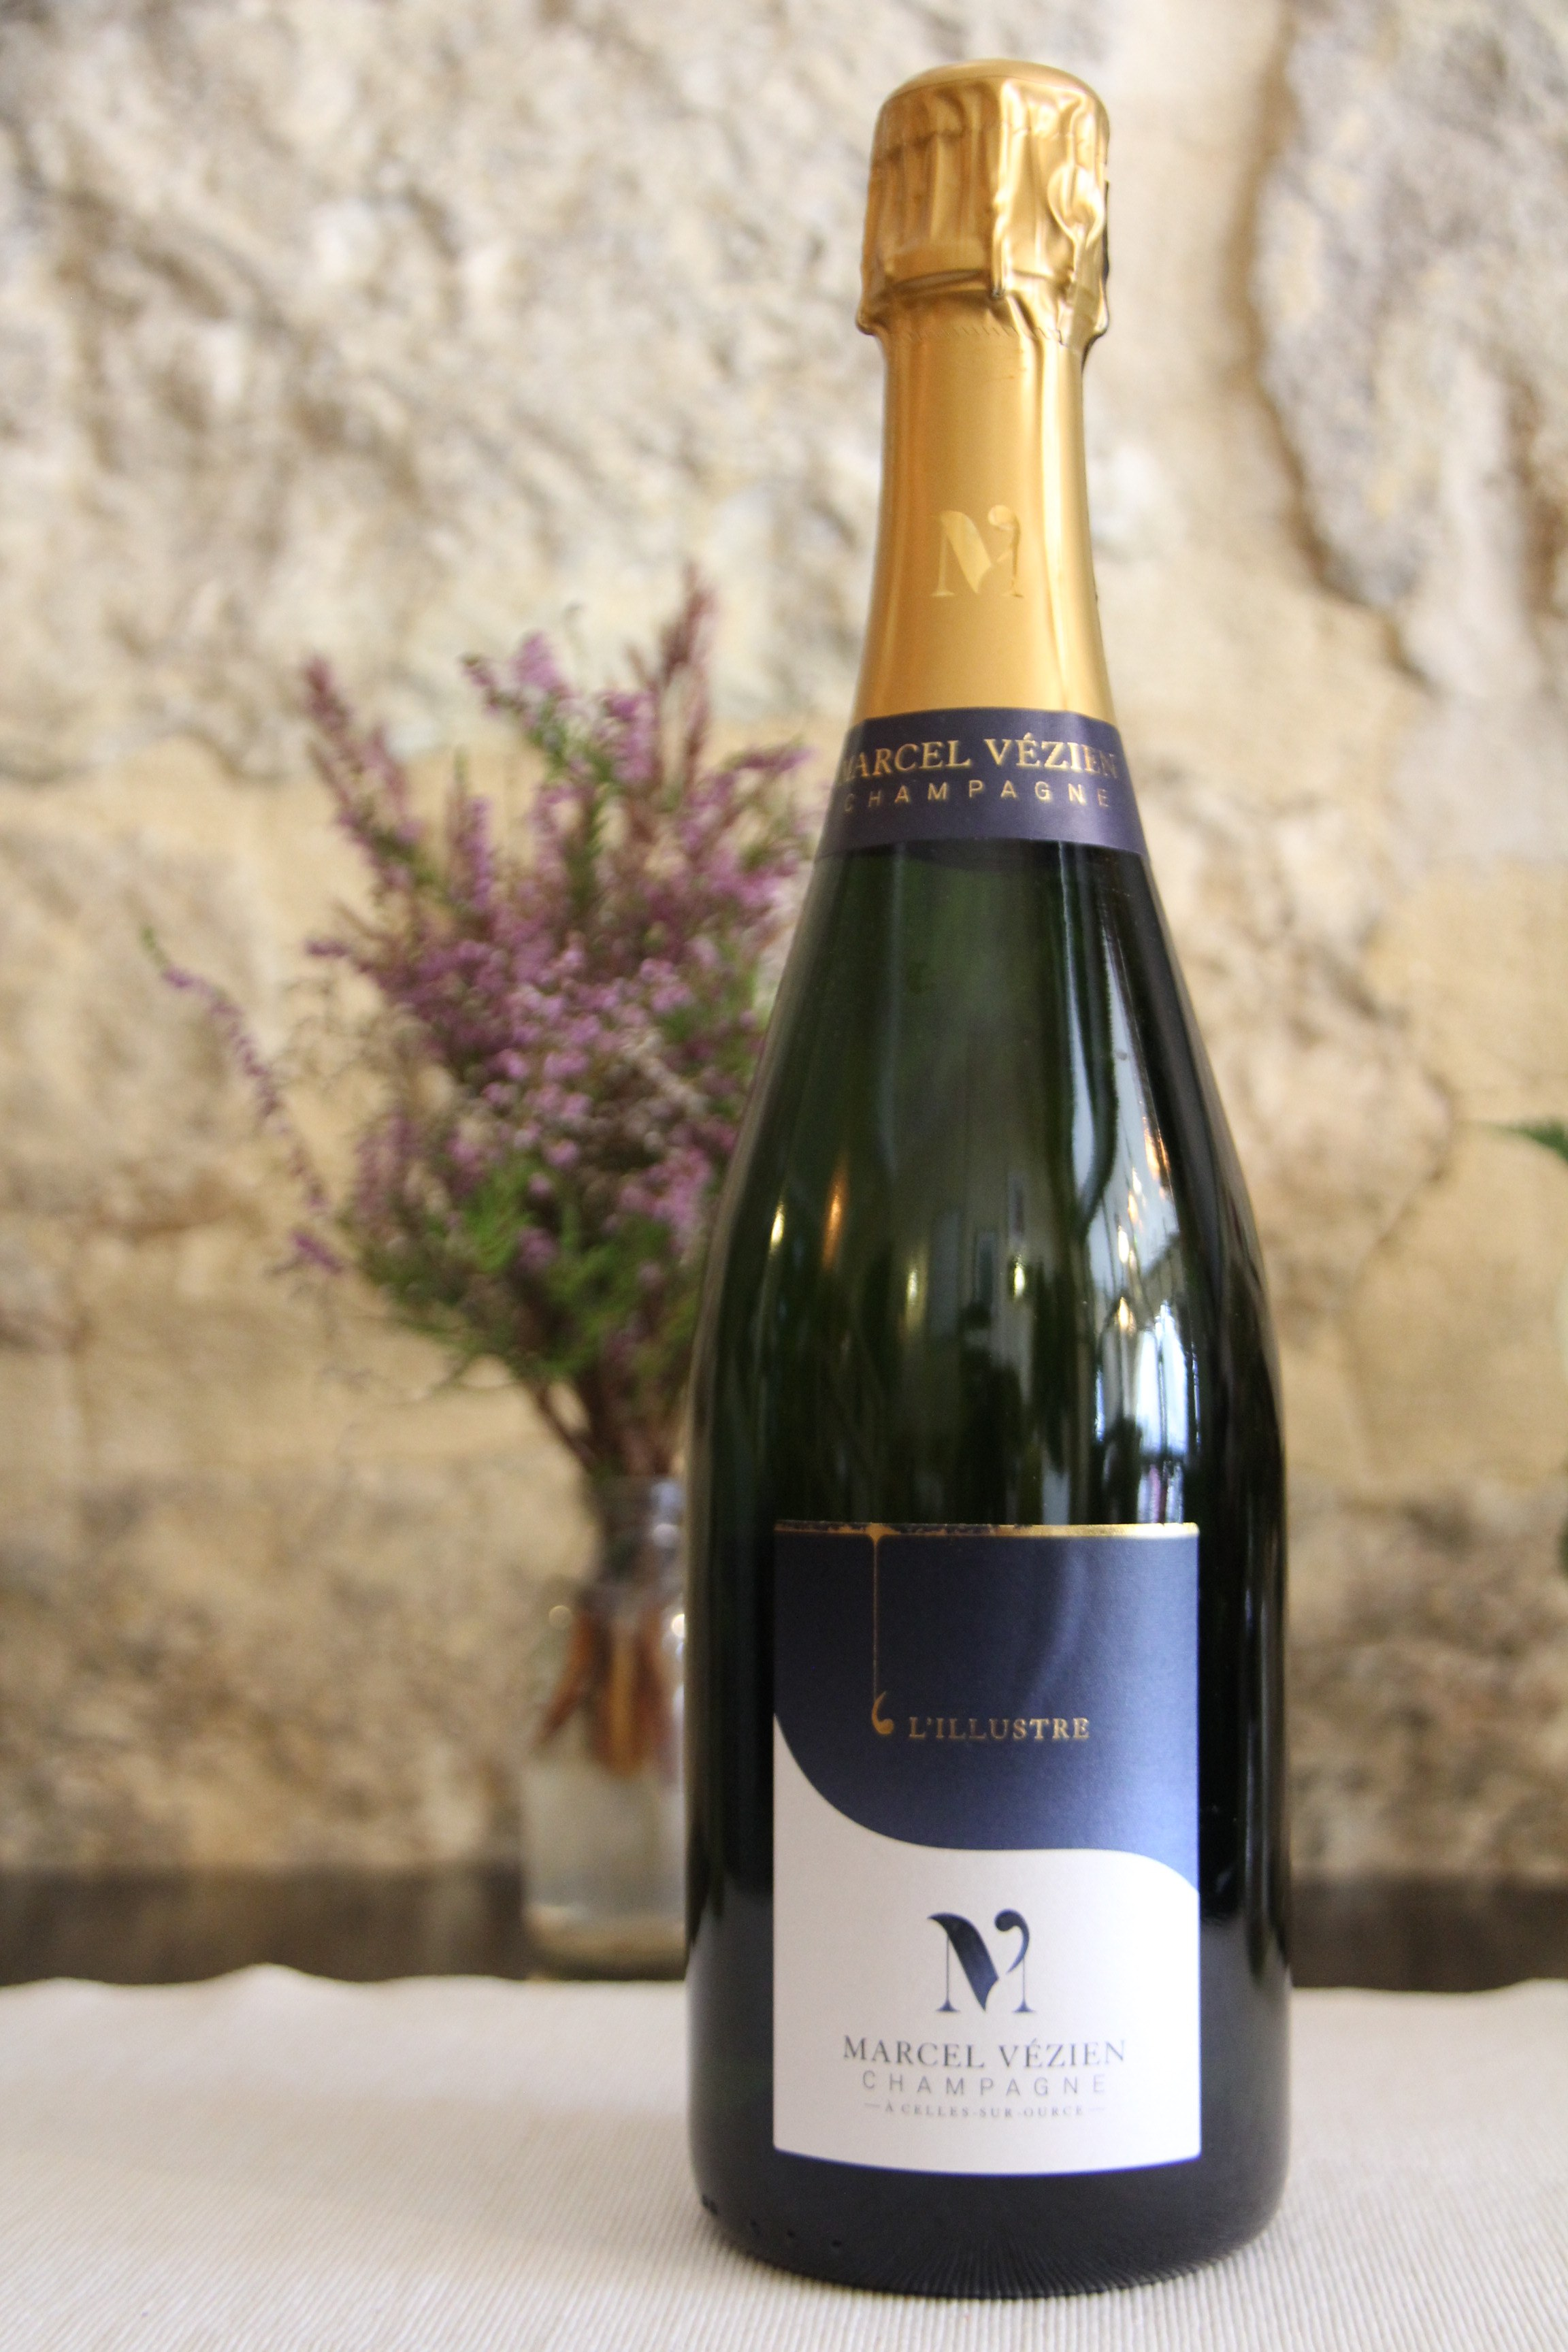 marcel Vezien champagne